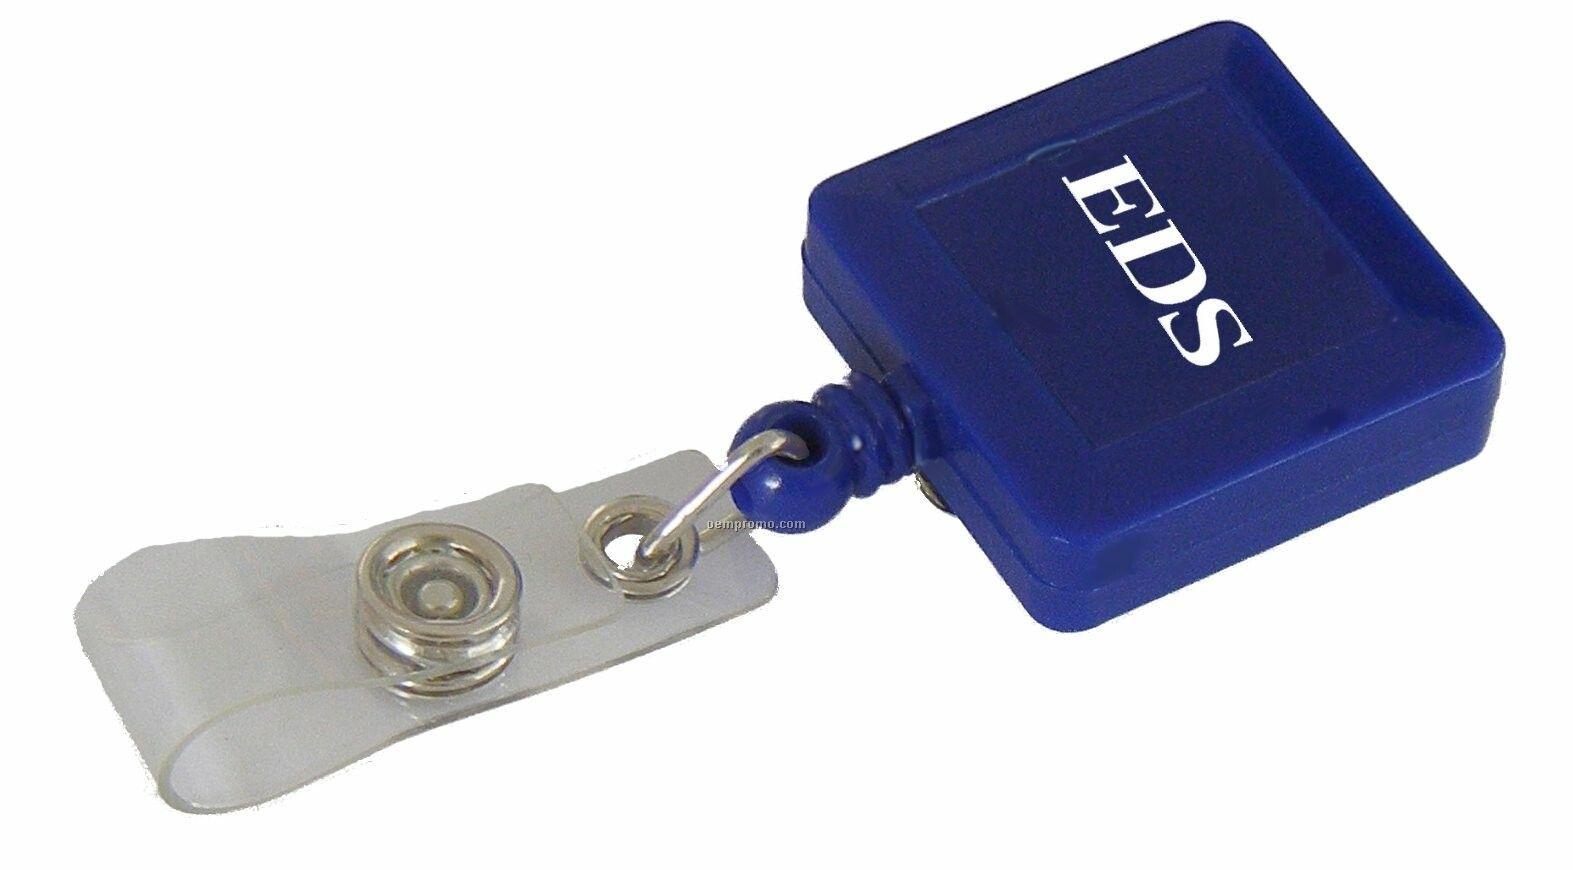 Retractable Badge Holder W/Metal Belt Clip